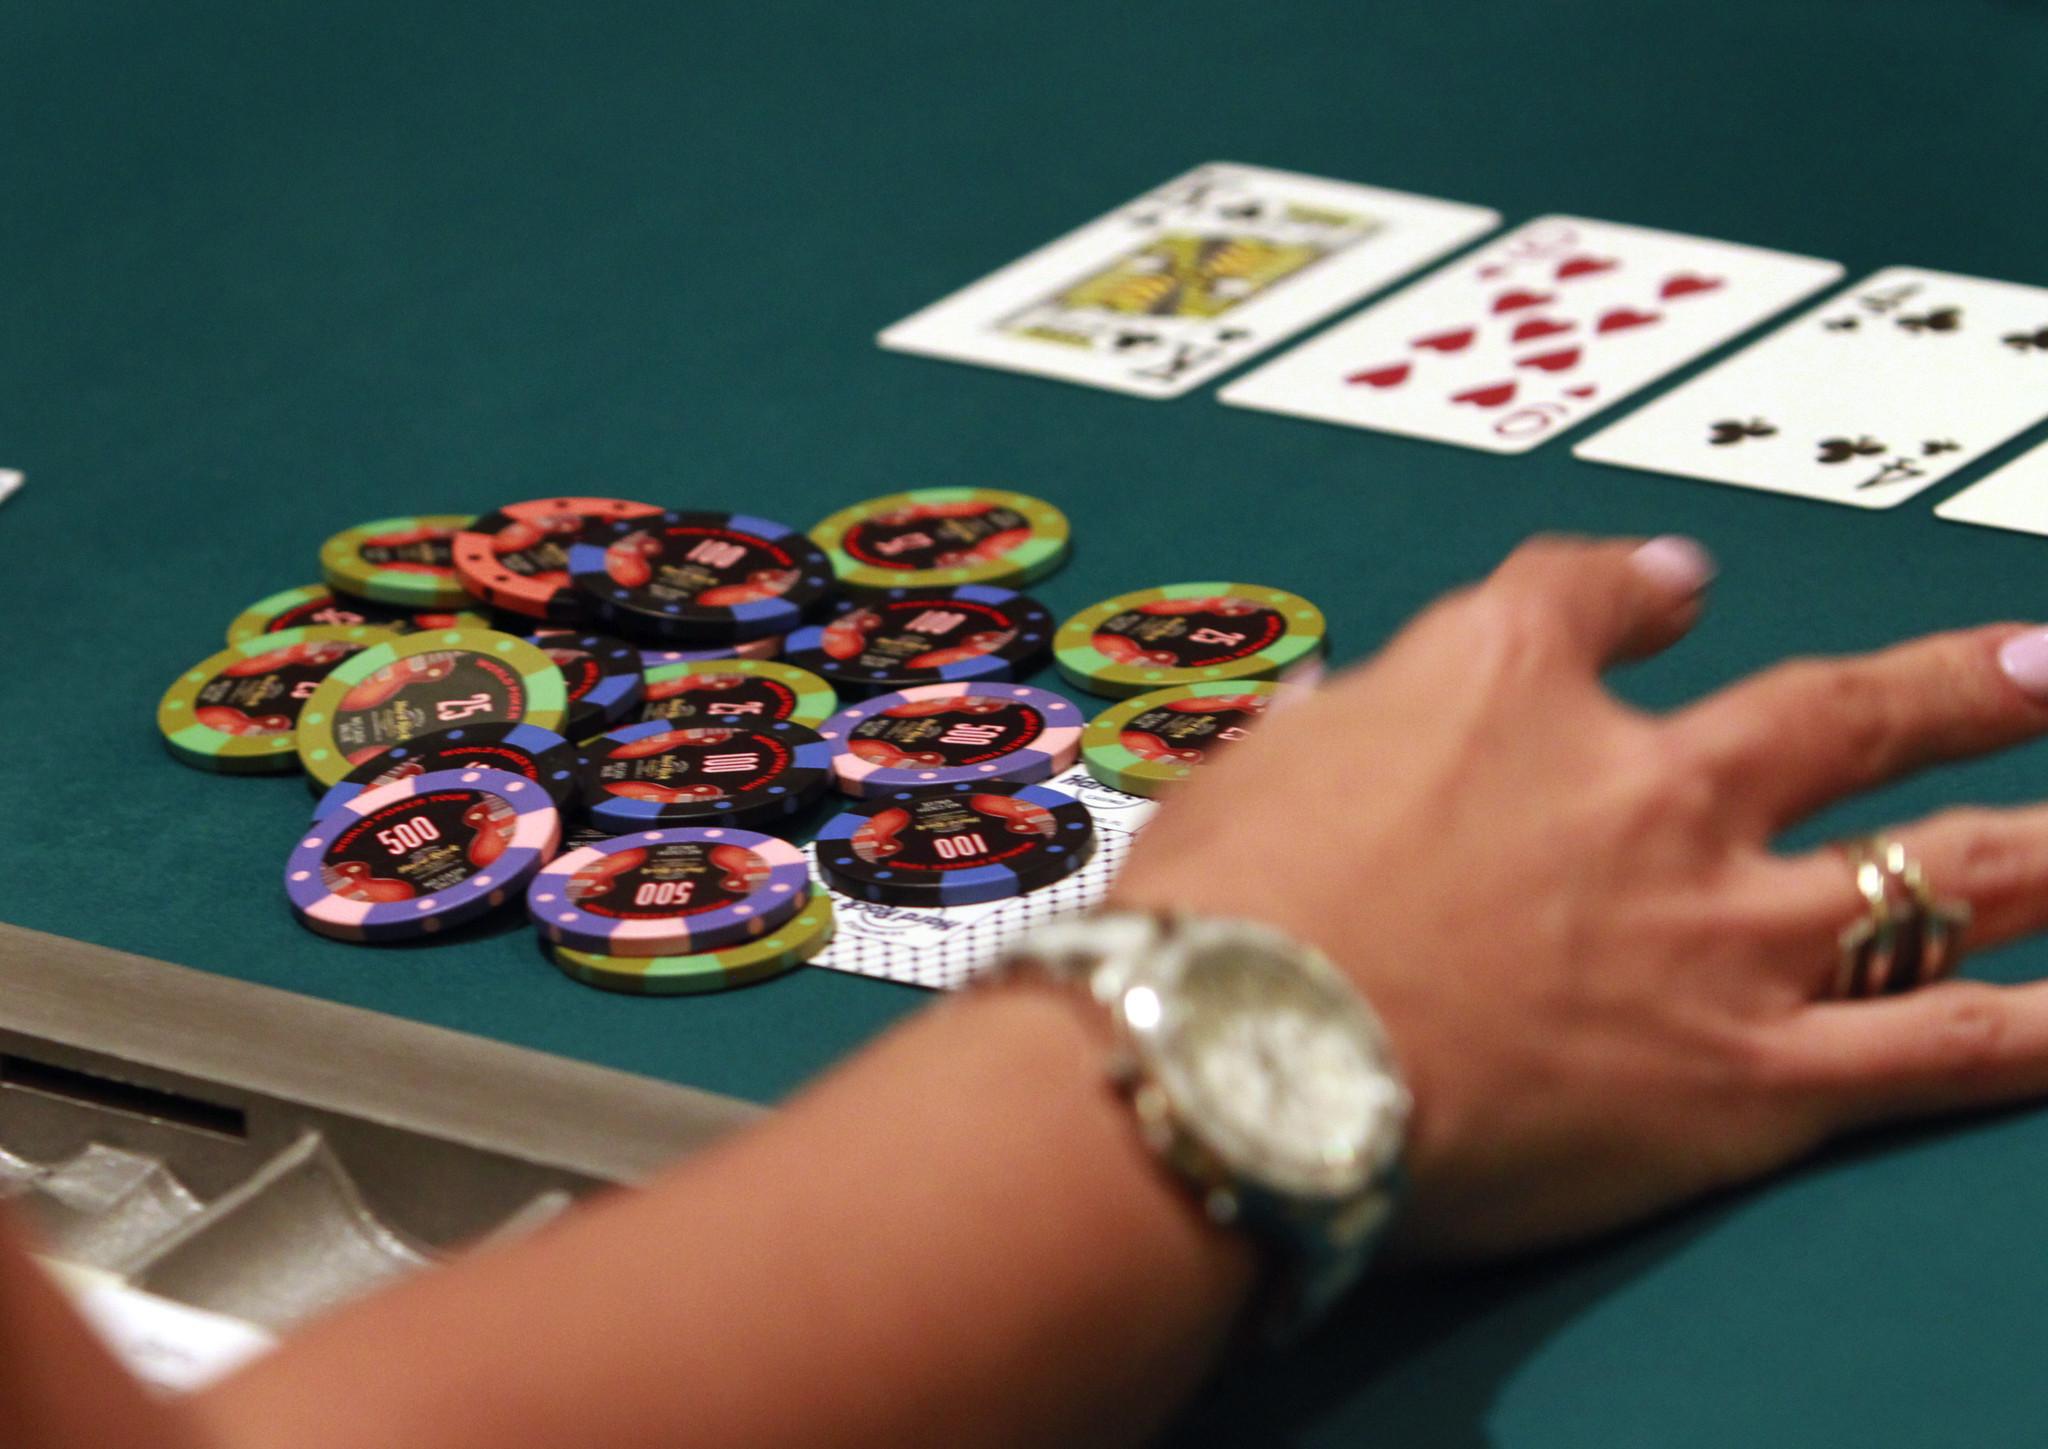 Palm Beach Kennel Club poker - Sun Sentinel